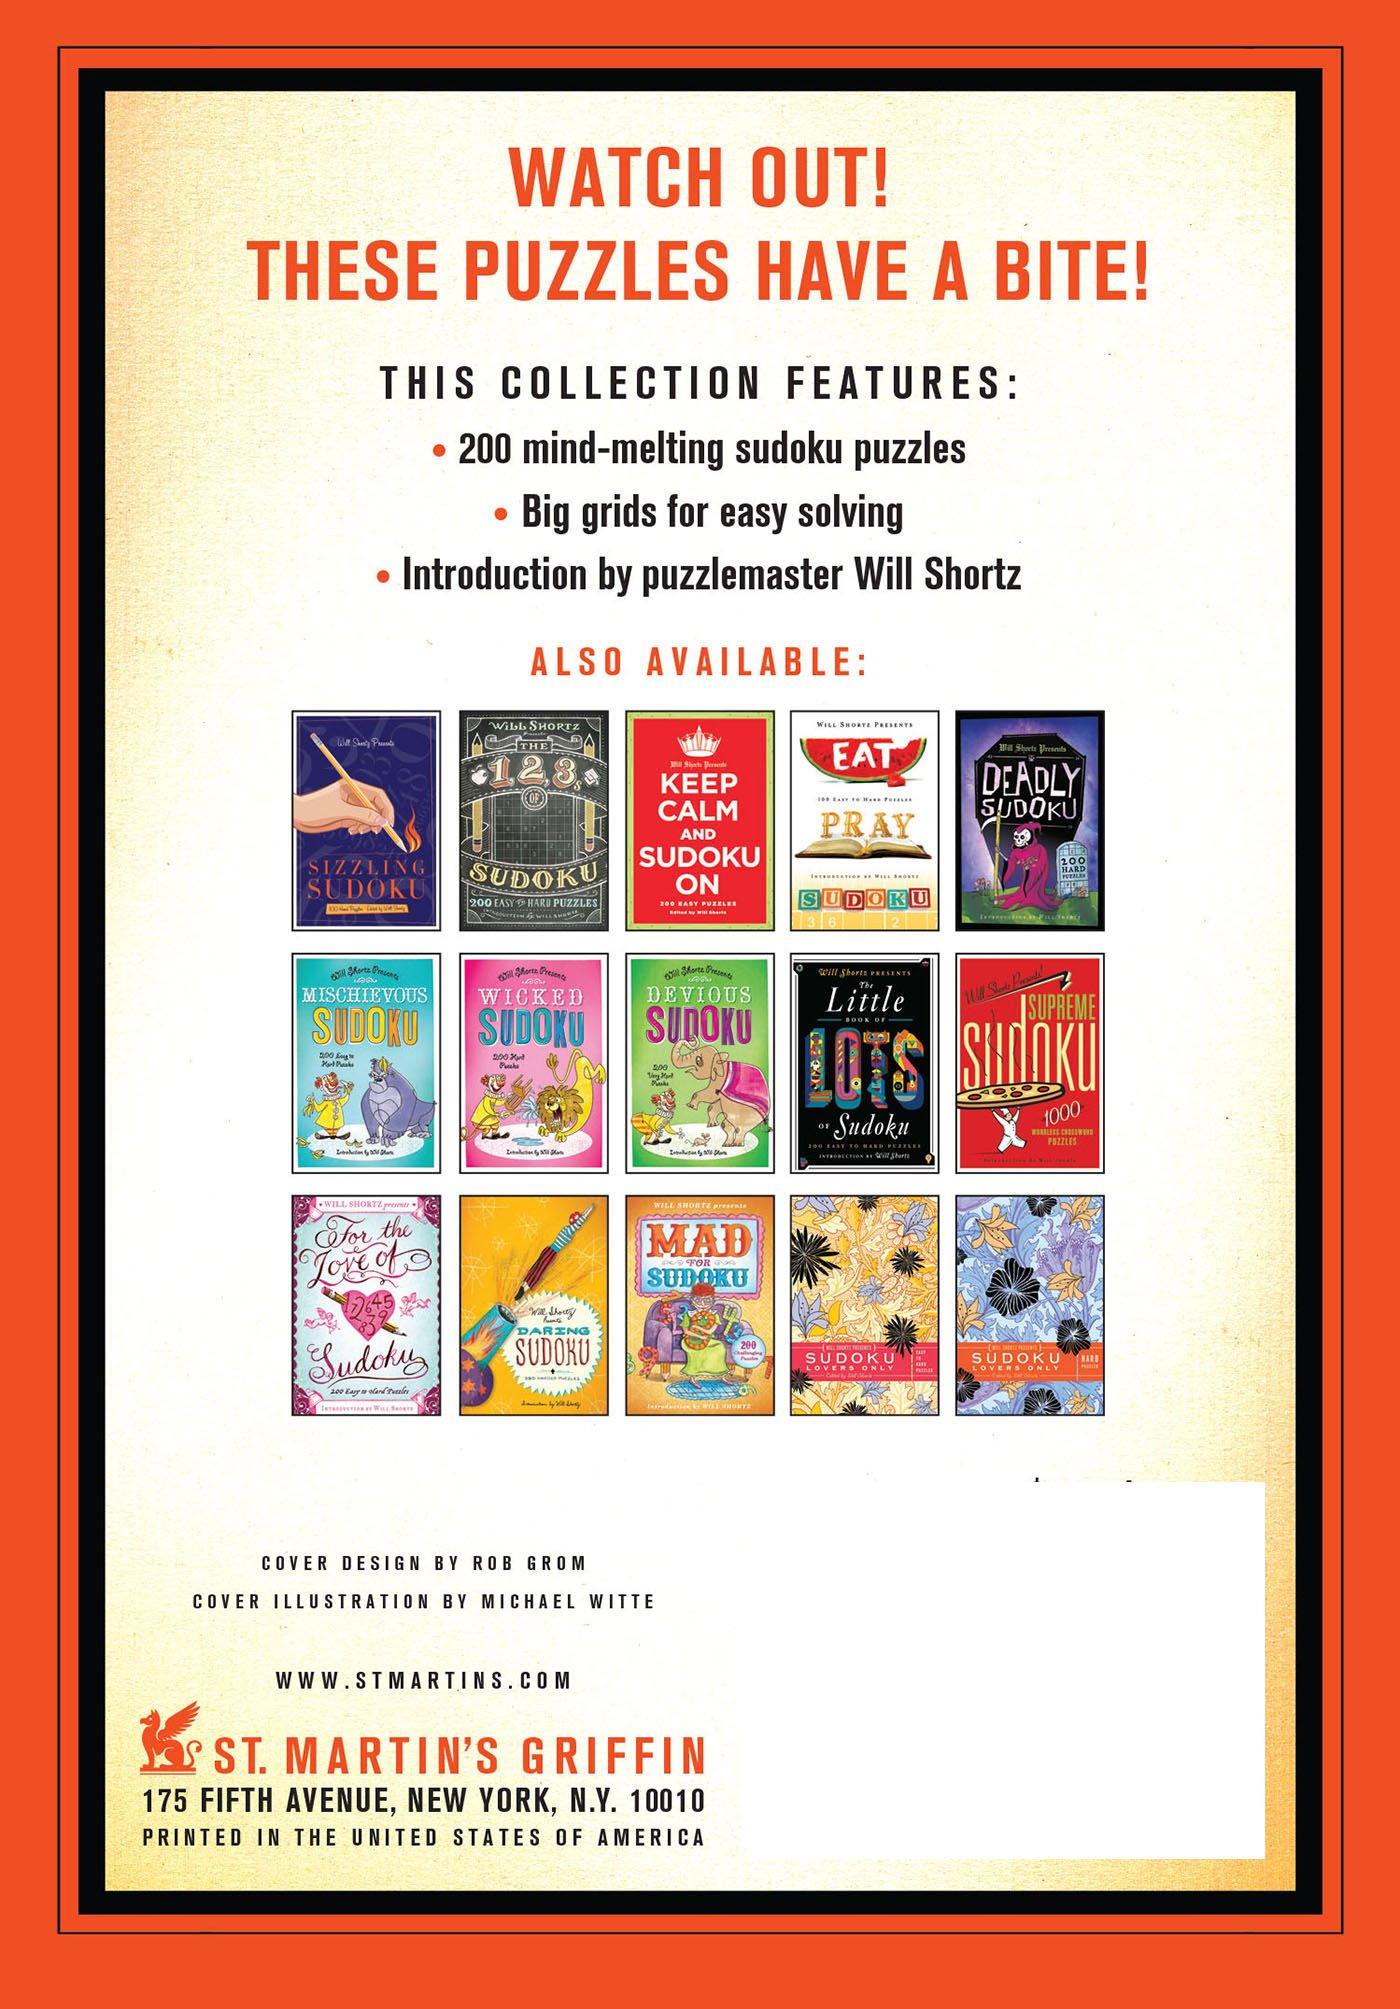 Will Shortz Presents Dangerous Sudoku: 200 Hard Puzzles: Will Shortz:  9781250025272: Amazon.com: Books